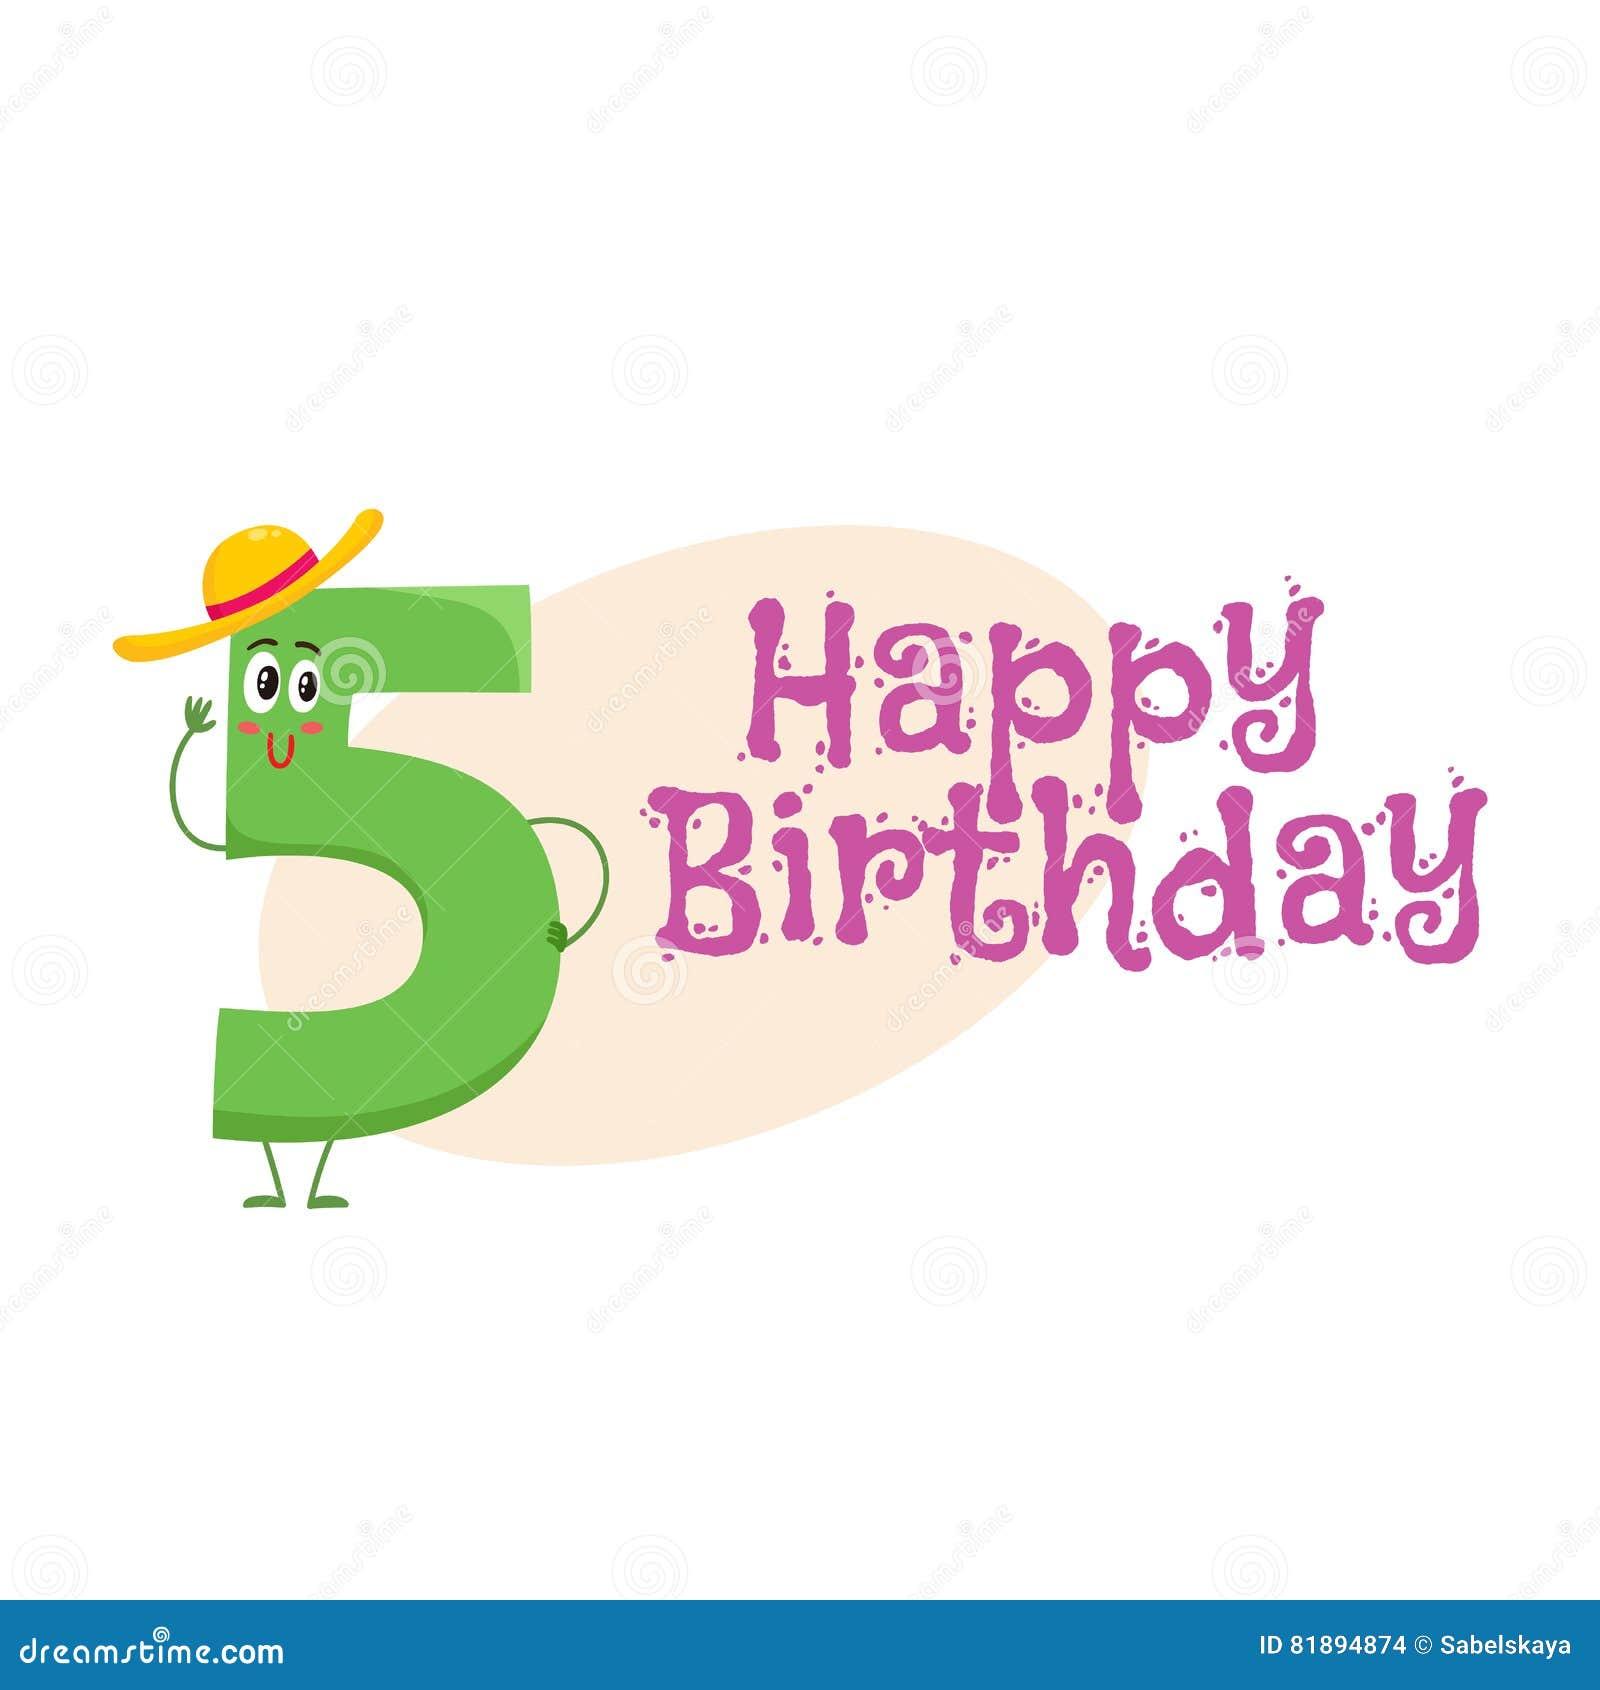 Happy birthday vector greeting card design with five number happy birthday vector greeting card design with five number characters kristyandbryce Gallery